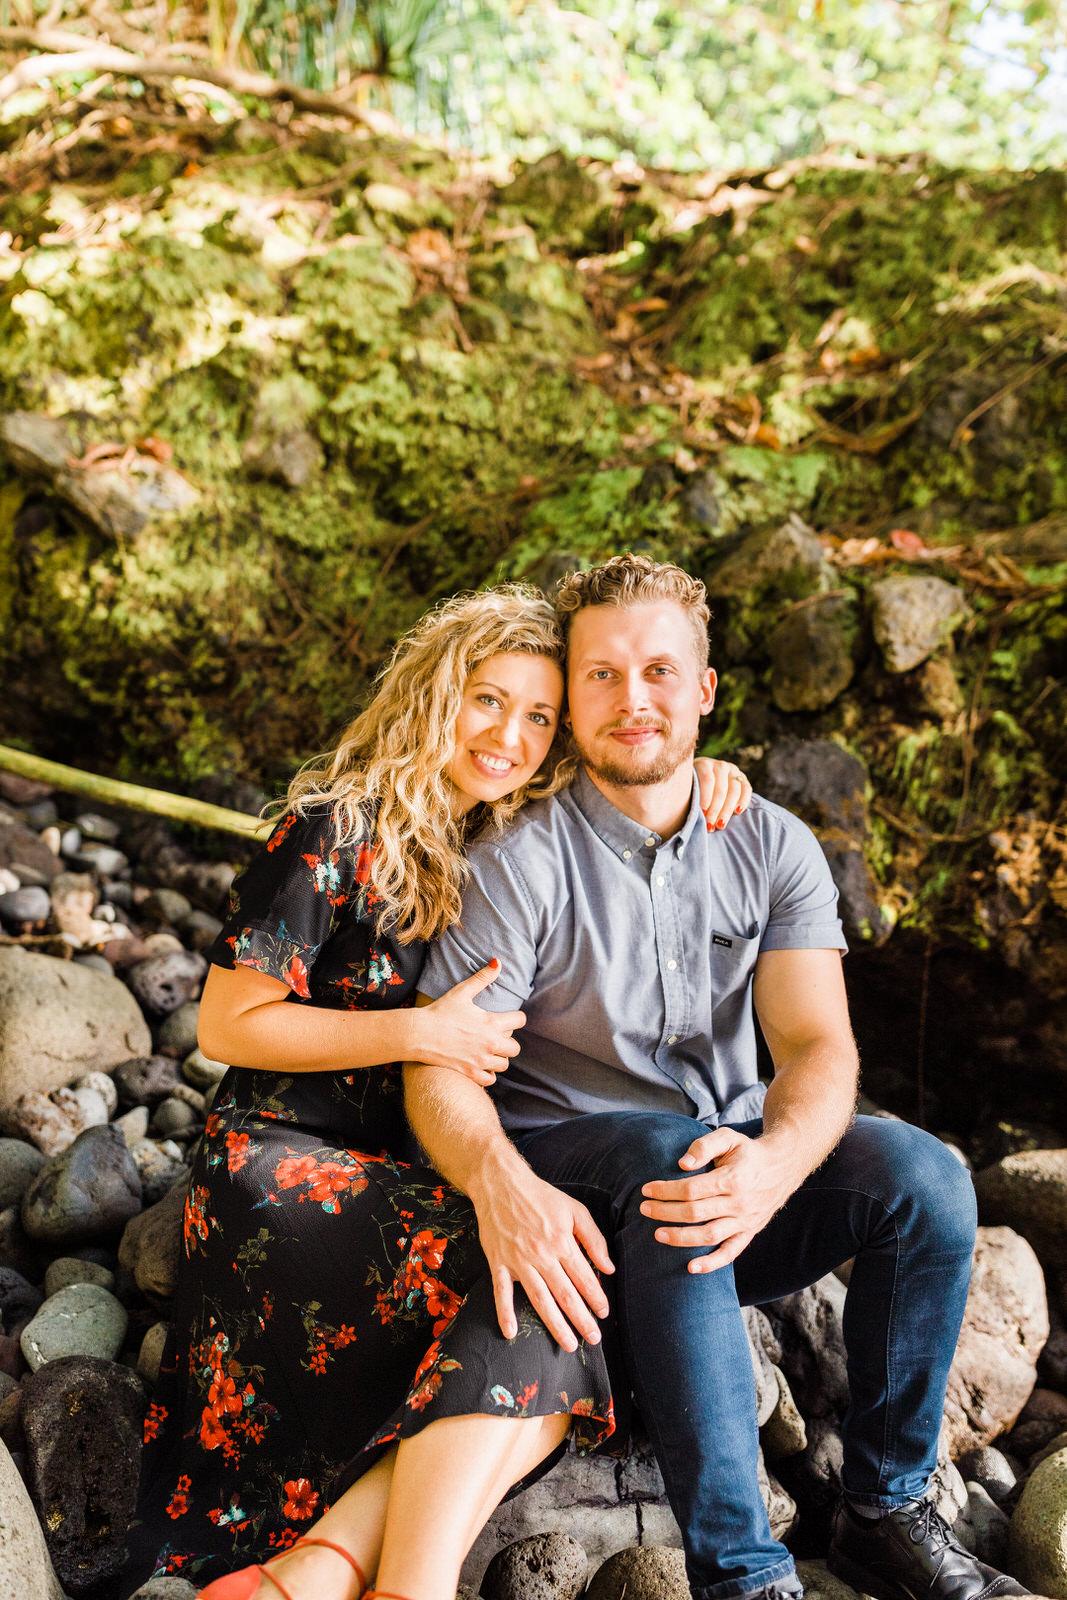 engagements-hilo-happy-couple-big-island-hawaii-22.jpg